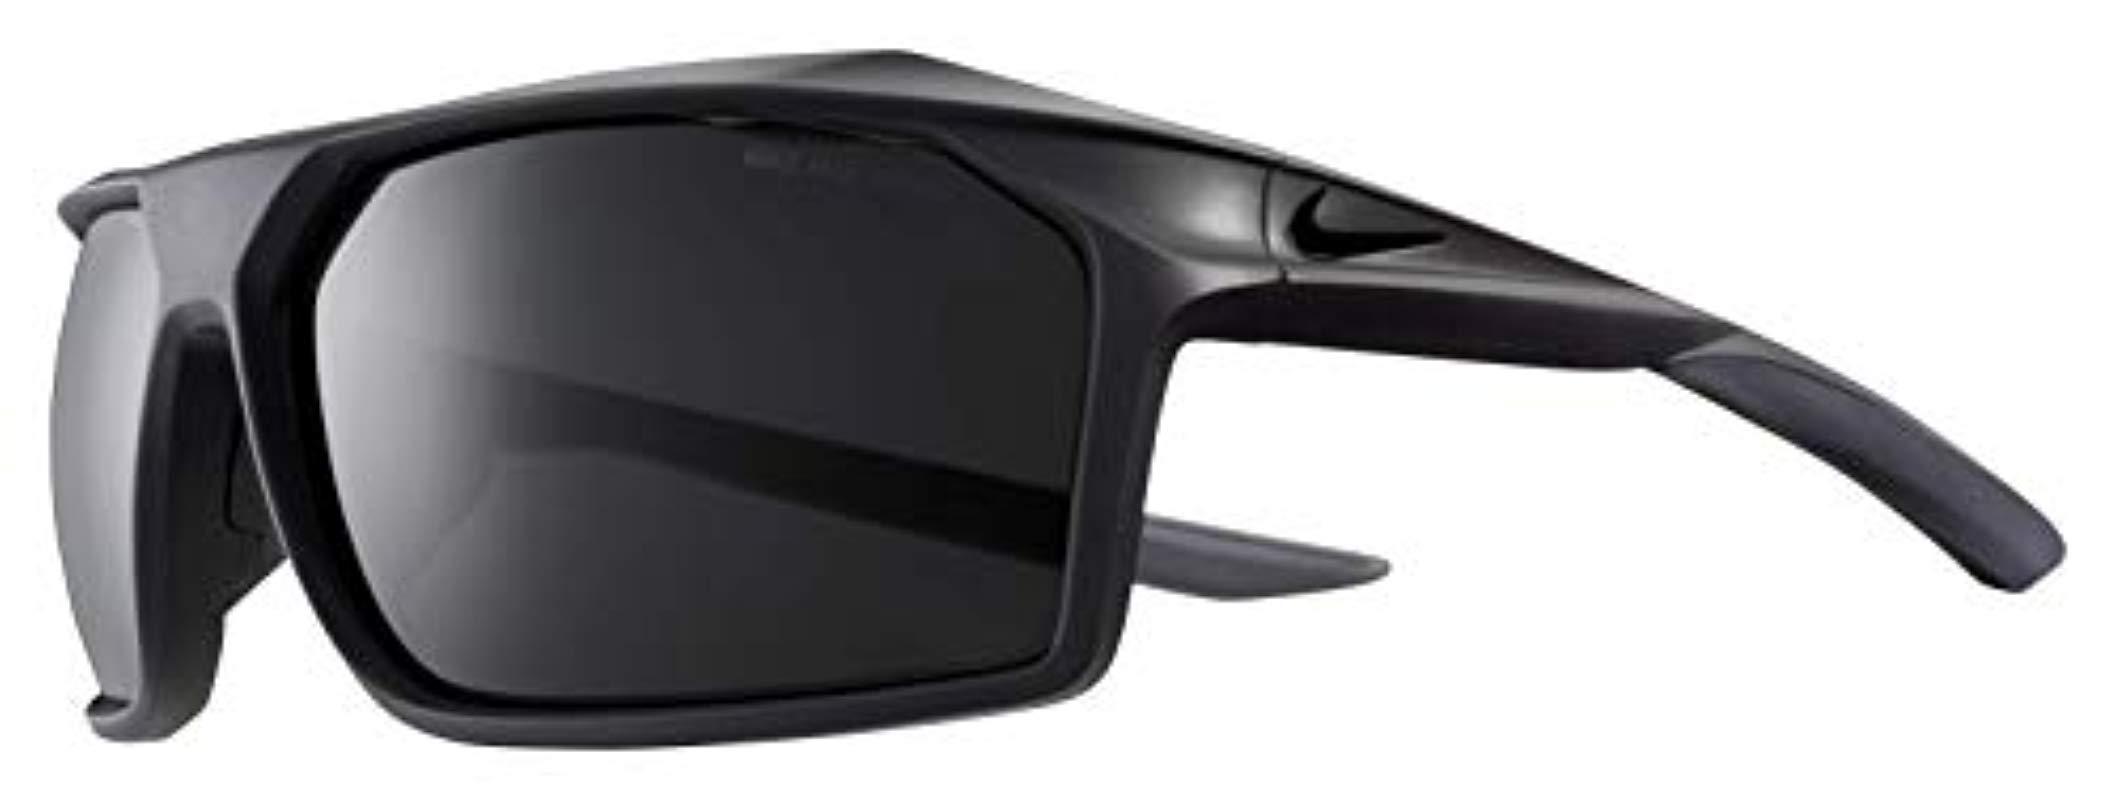 a7126c33093b Nike. Men's Gray Eyewear Traverse Rectangular Sunglasses Matte Oil ...